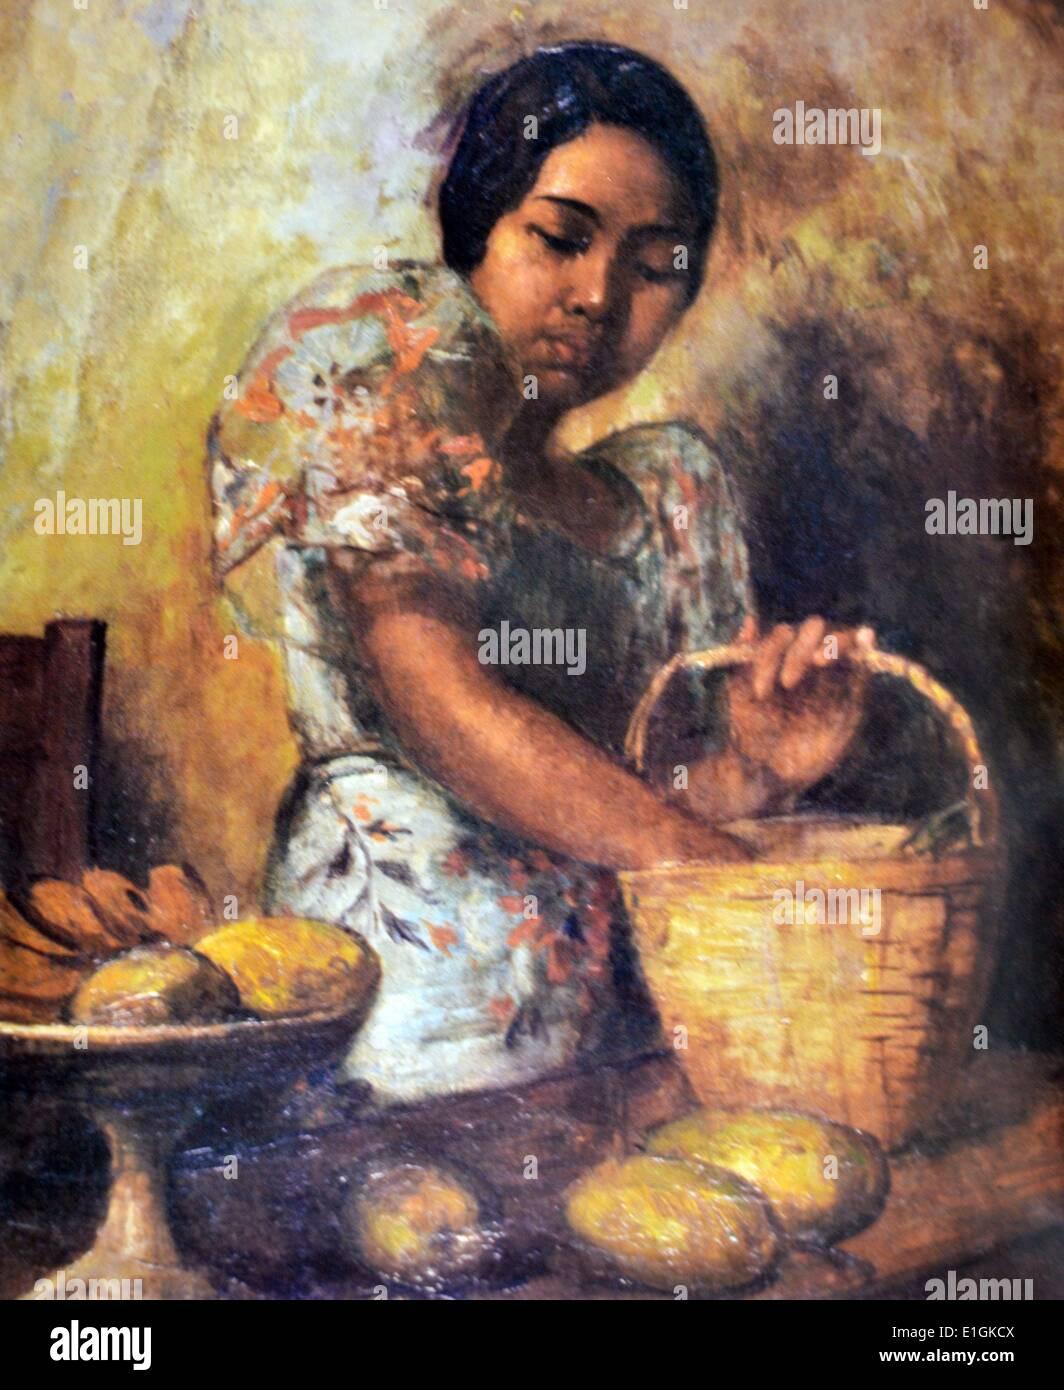 Fabian De La Rosa, Woman selecting Mangoes, 1935..  Oil on wood. - Stock Image